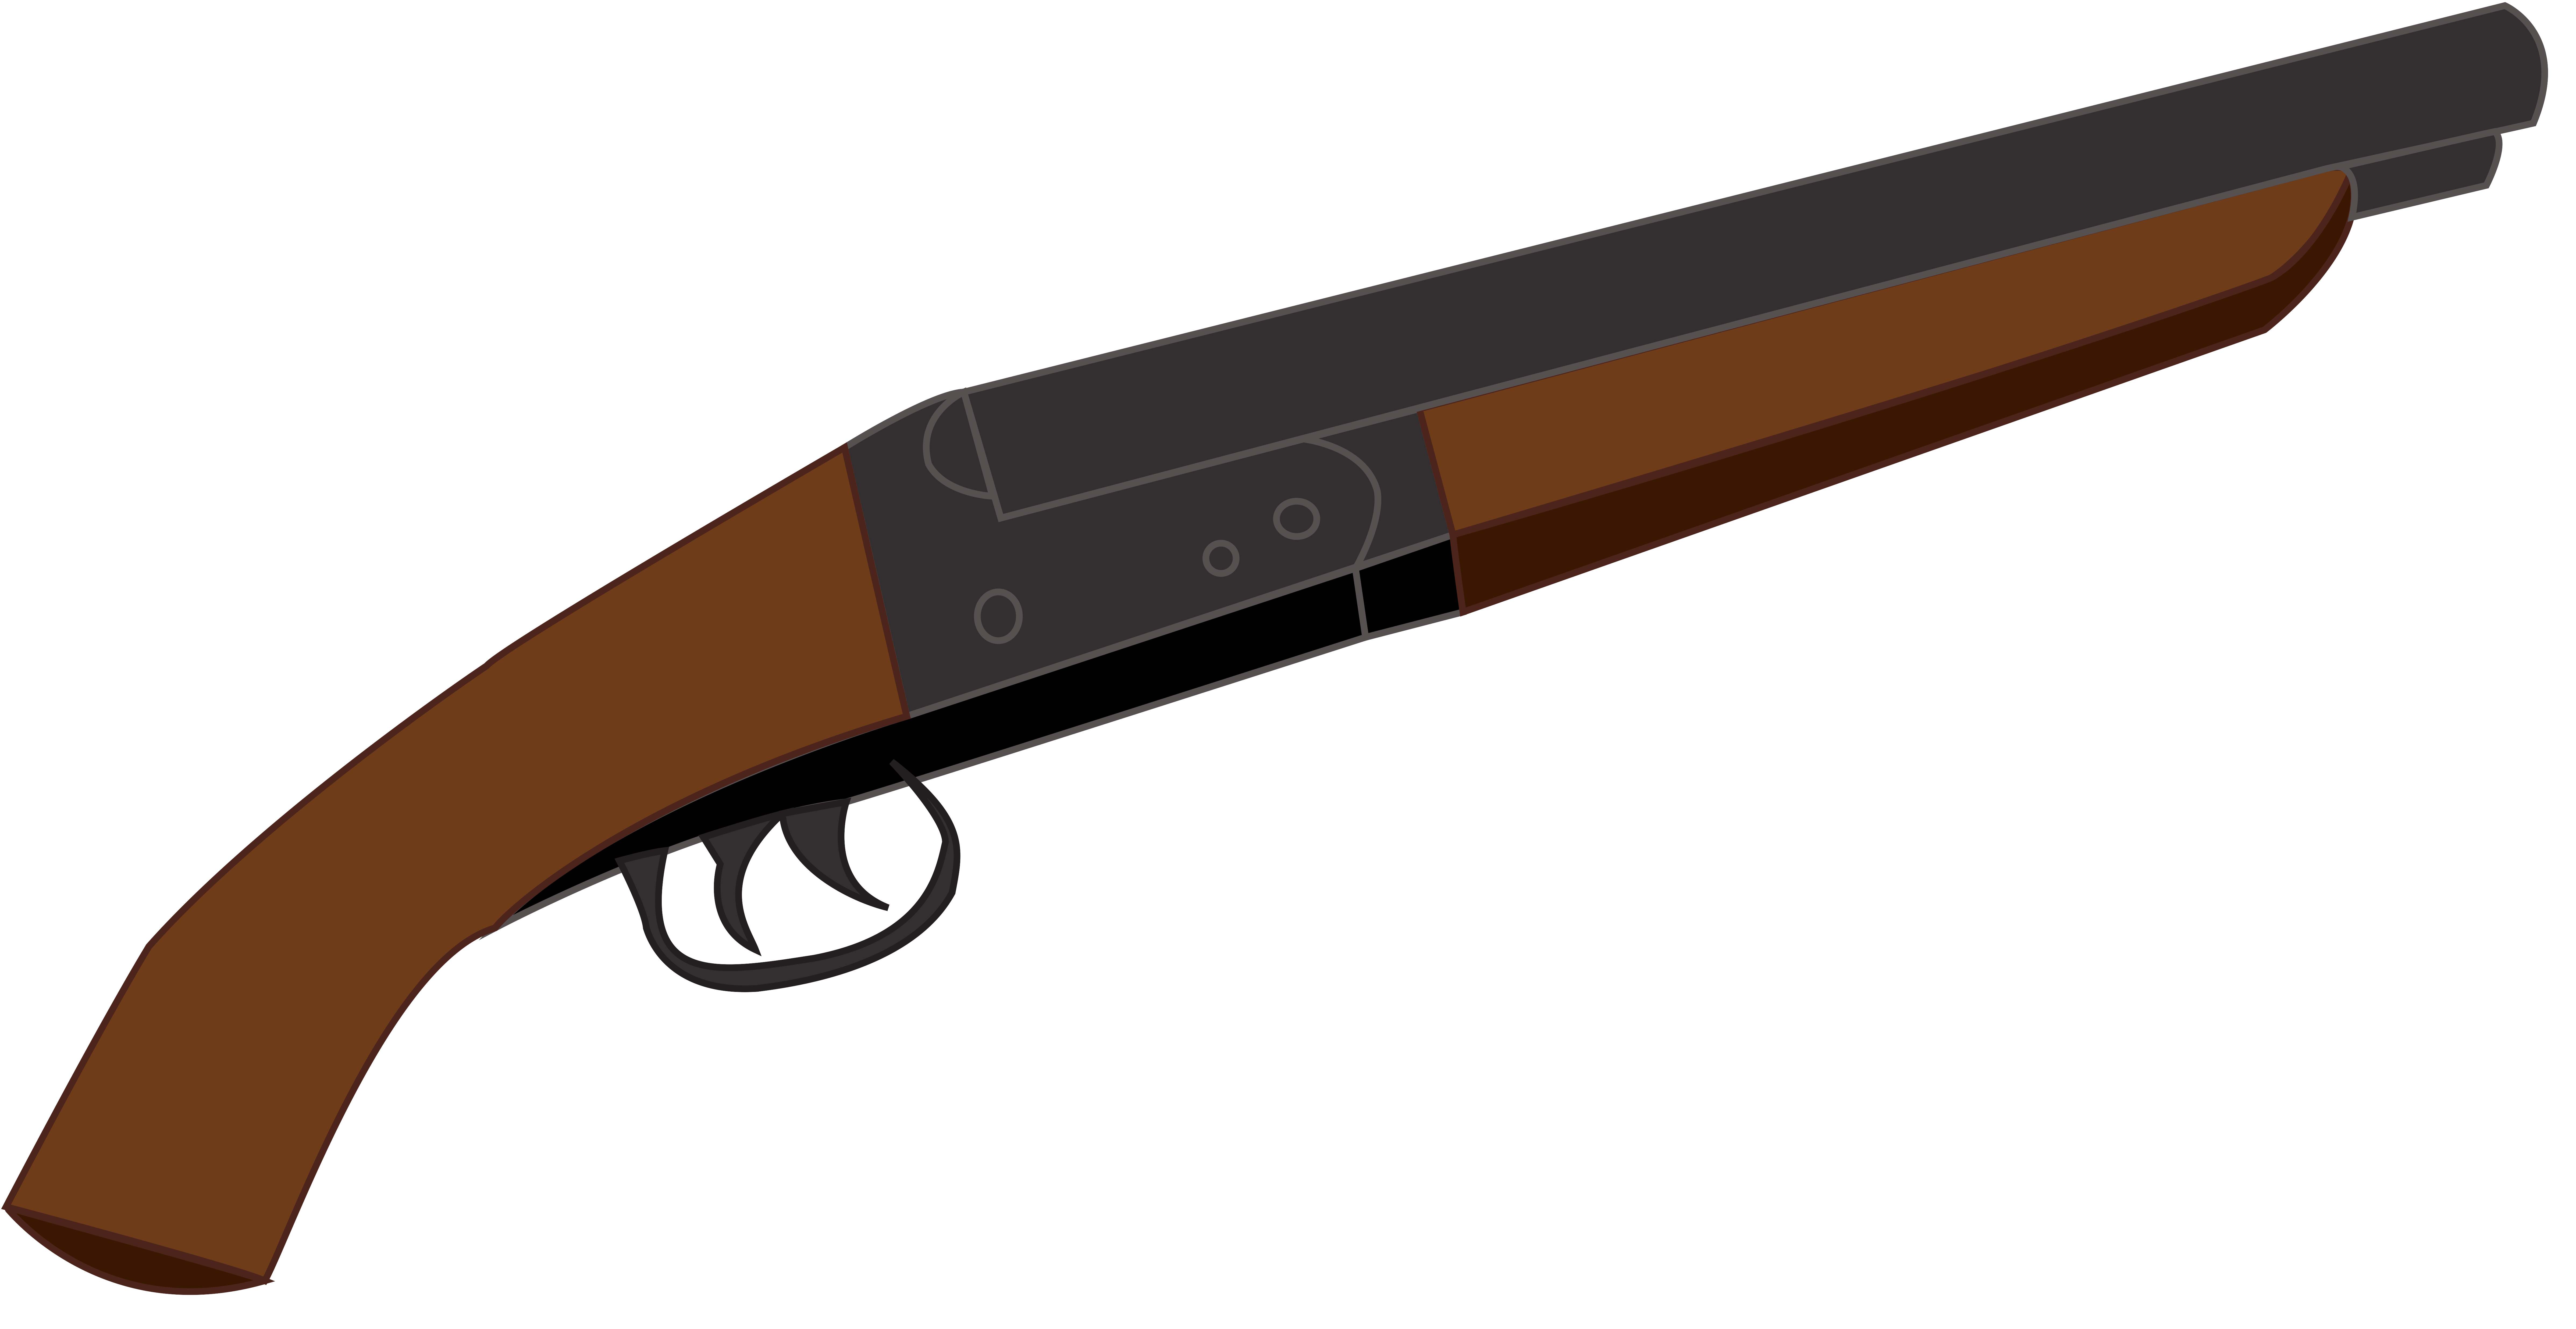 Clipart gun shotgun. Sawed off double barrel